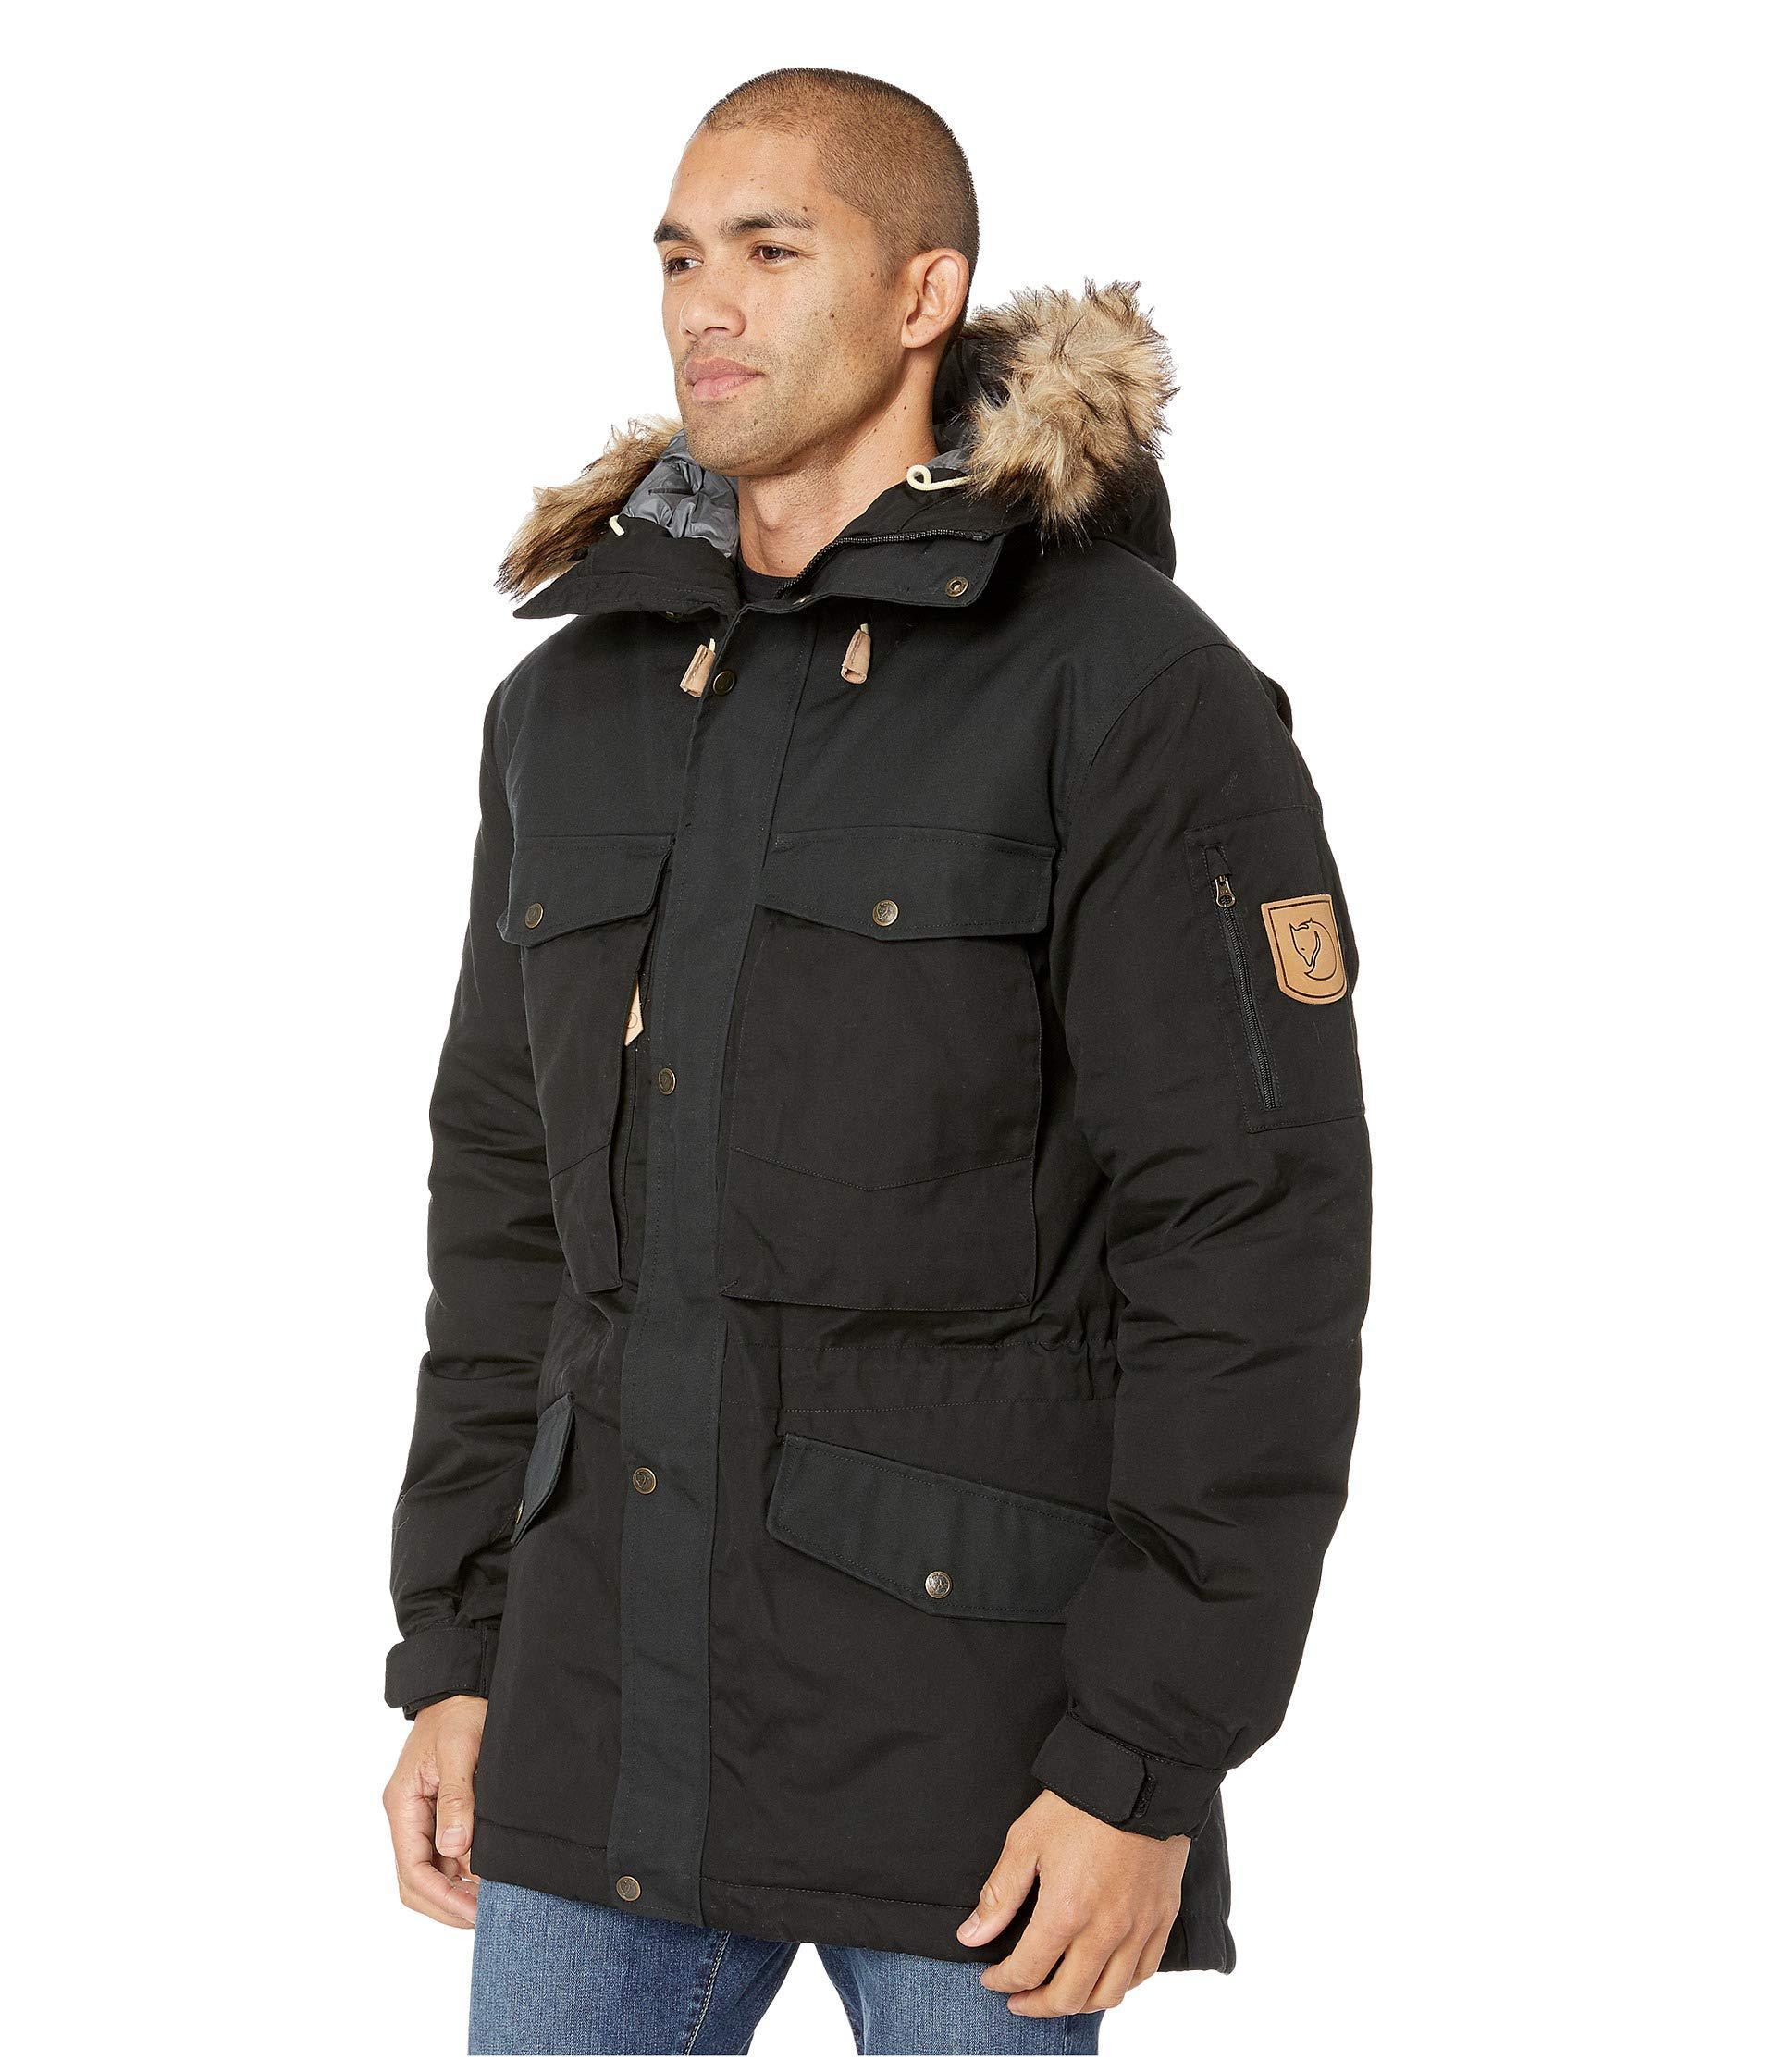 e0685f0e25b14 Lyst - Fjallraven Singi Down Jacket (black) Men s Coat in Black for Men